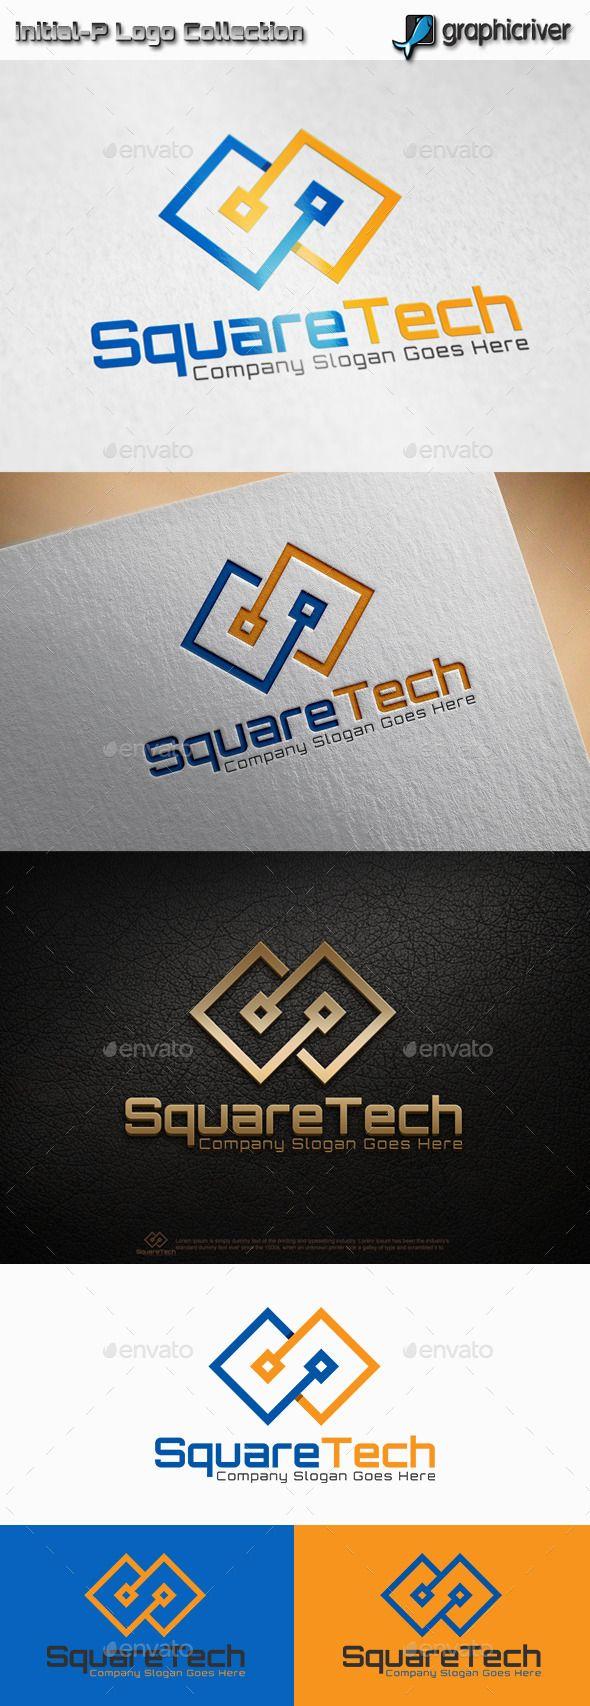 Square Tech Logo Template #design #logotype Download: http://graphicriver.net/item/square-tech-logo/11441533?ref=ksioks